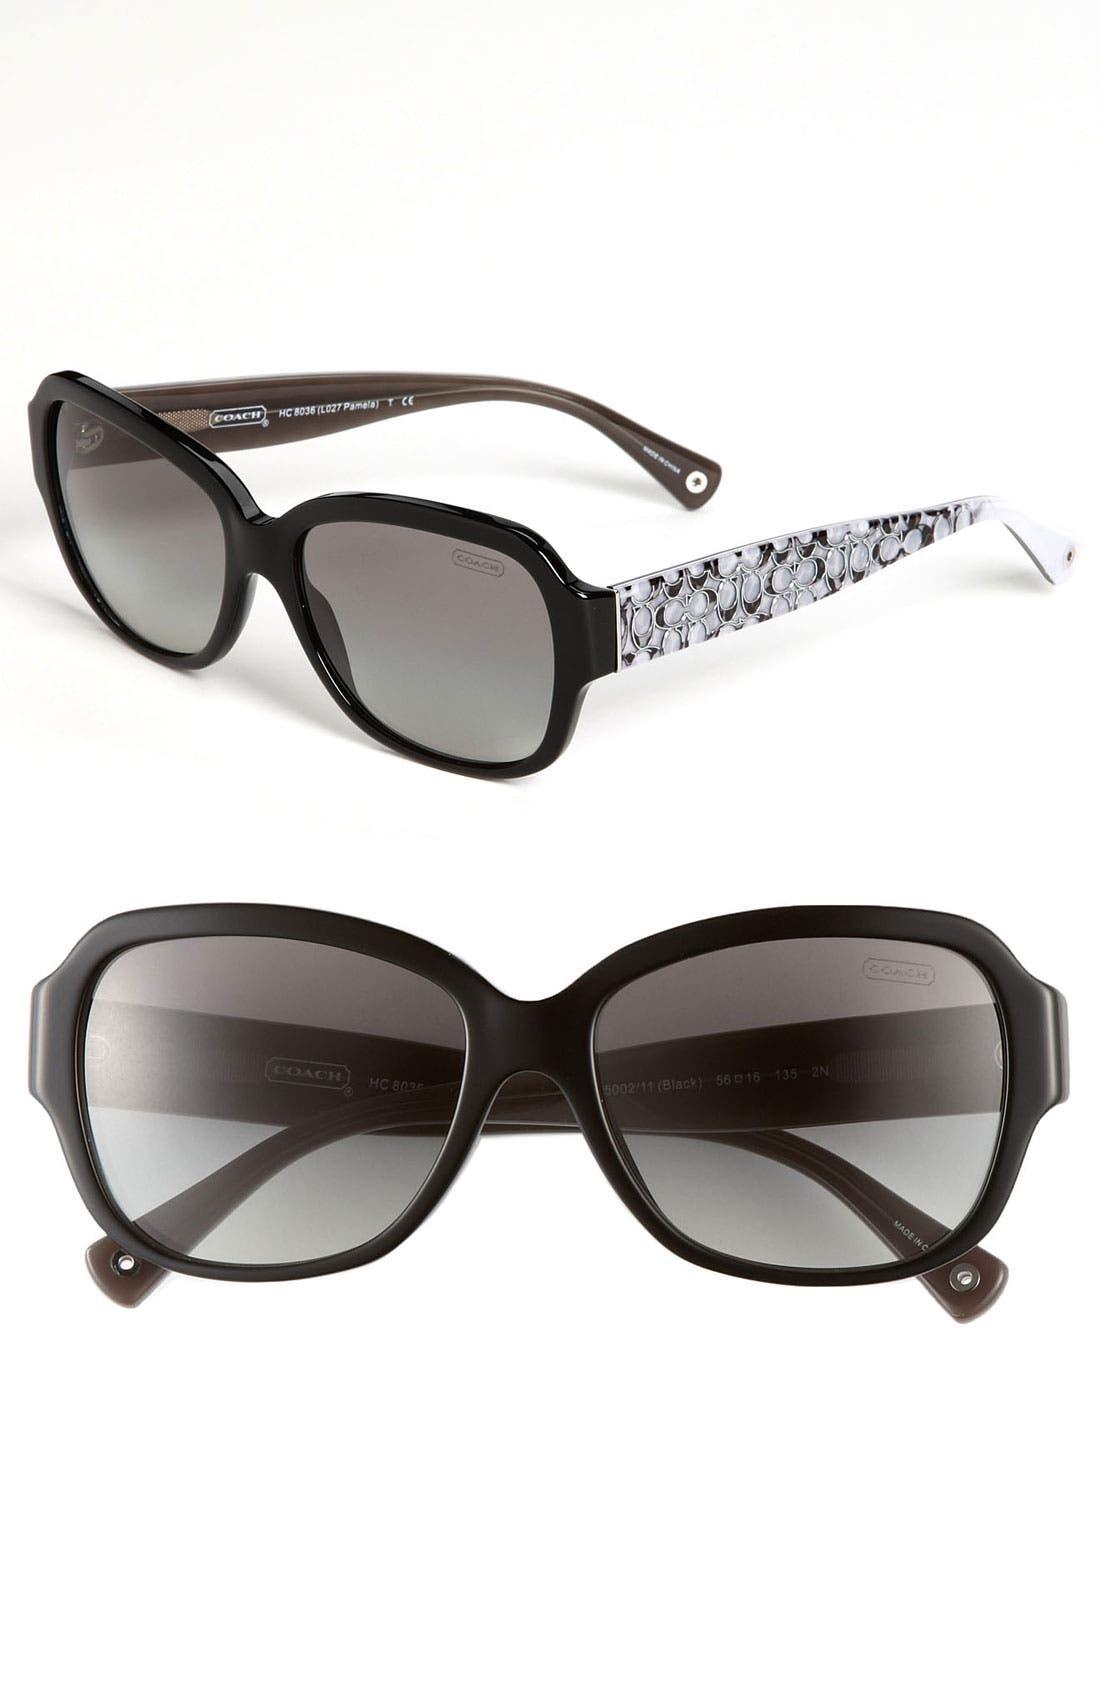 Main Image - COACH 56mm Oversized Plastic Sunglasses